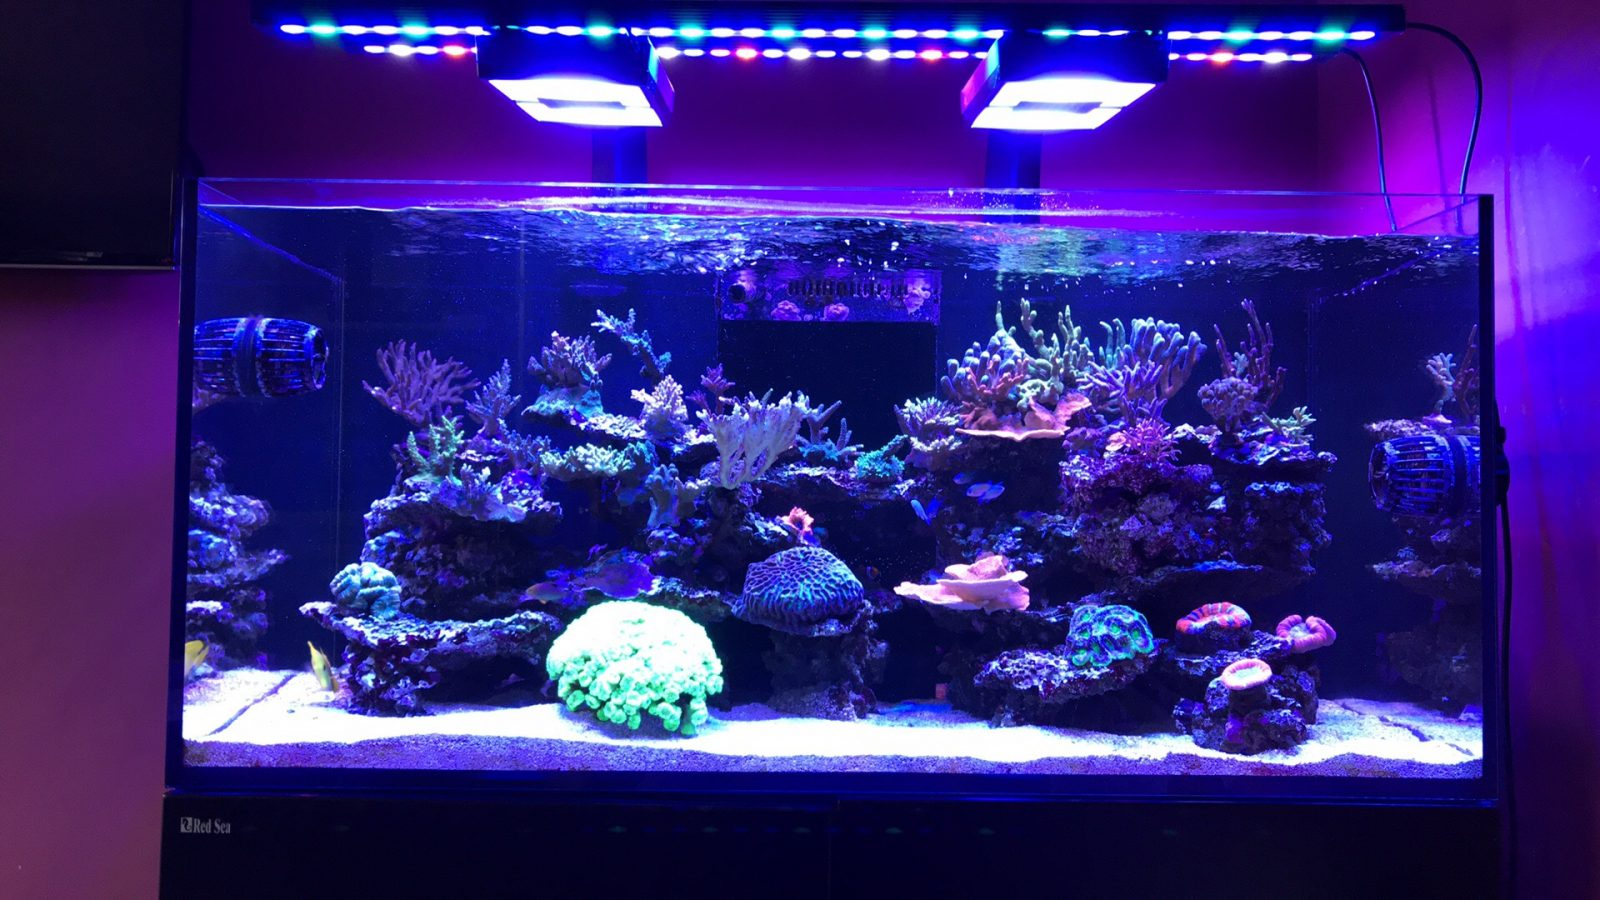 strip akuarium LED terbaik